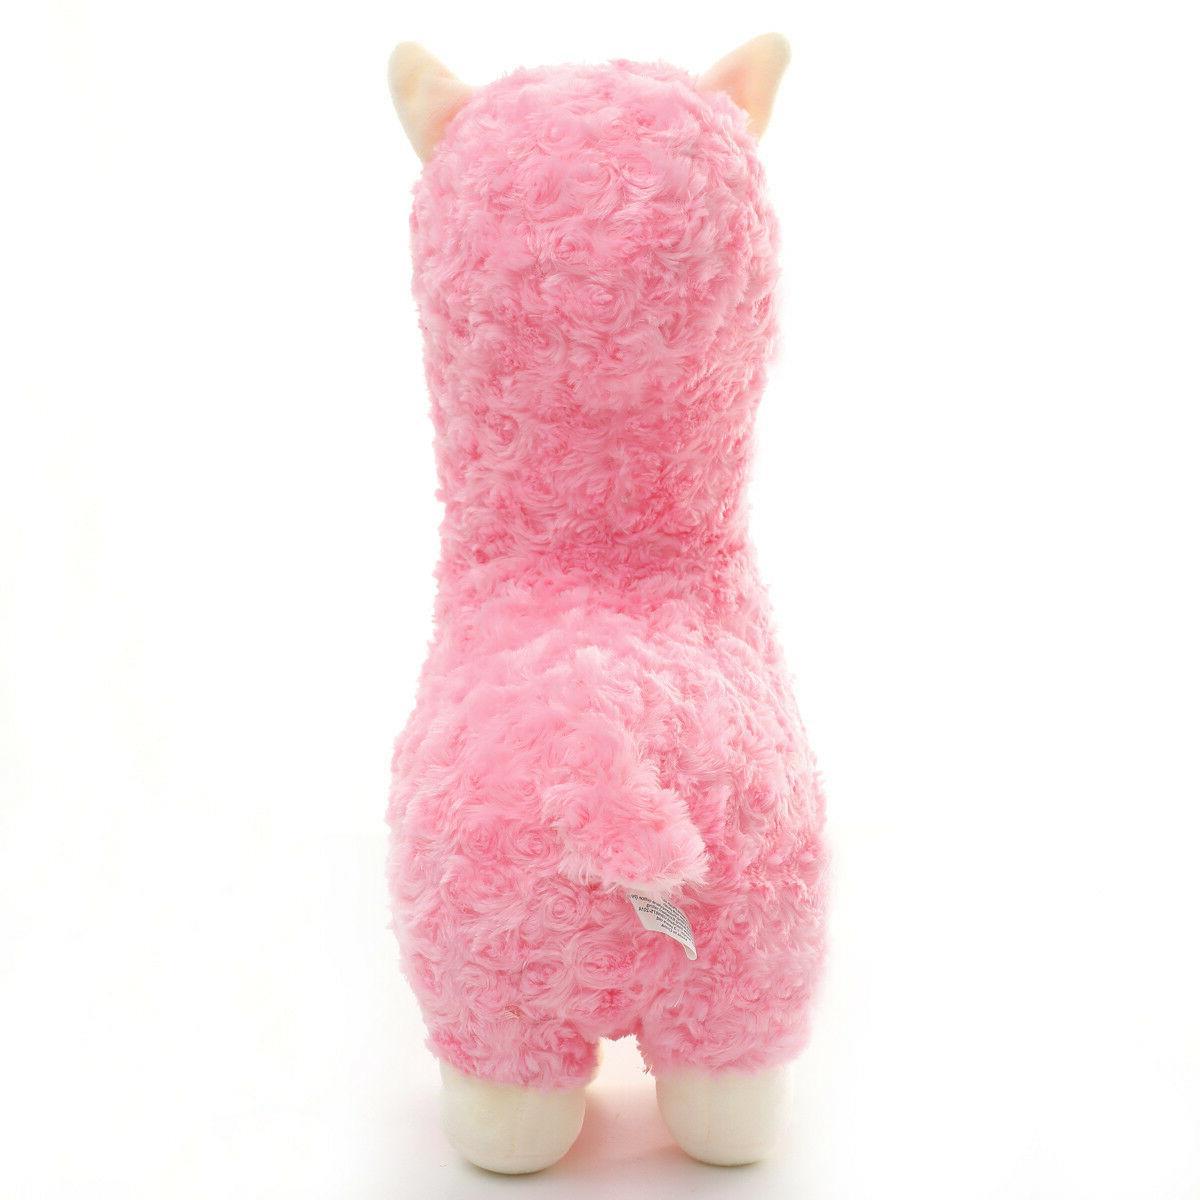 Winsterch Animals Llama Alpaca Plush Toy